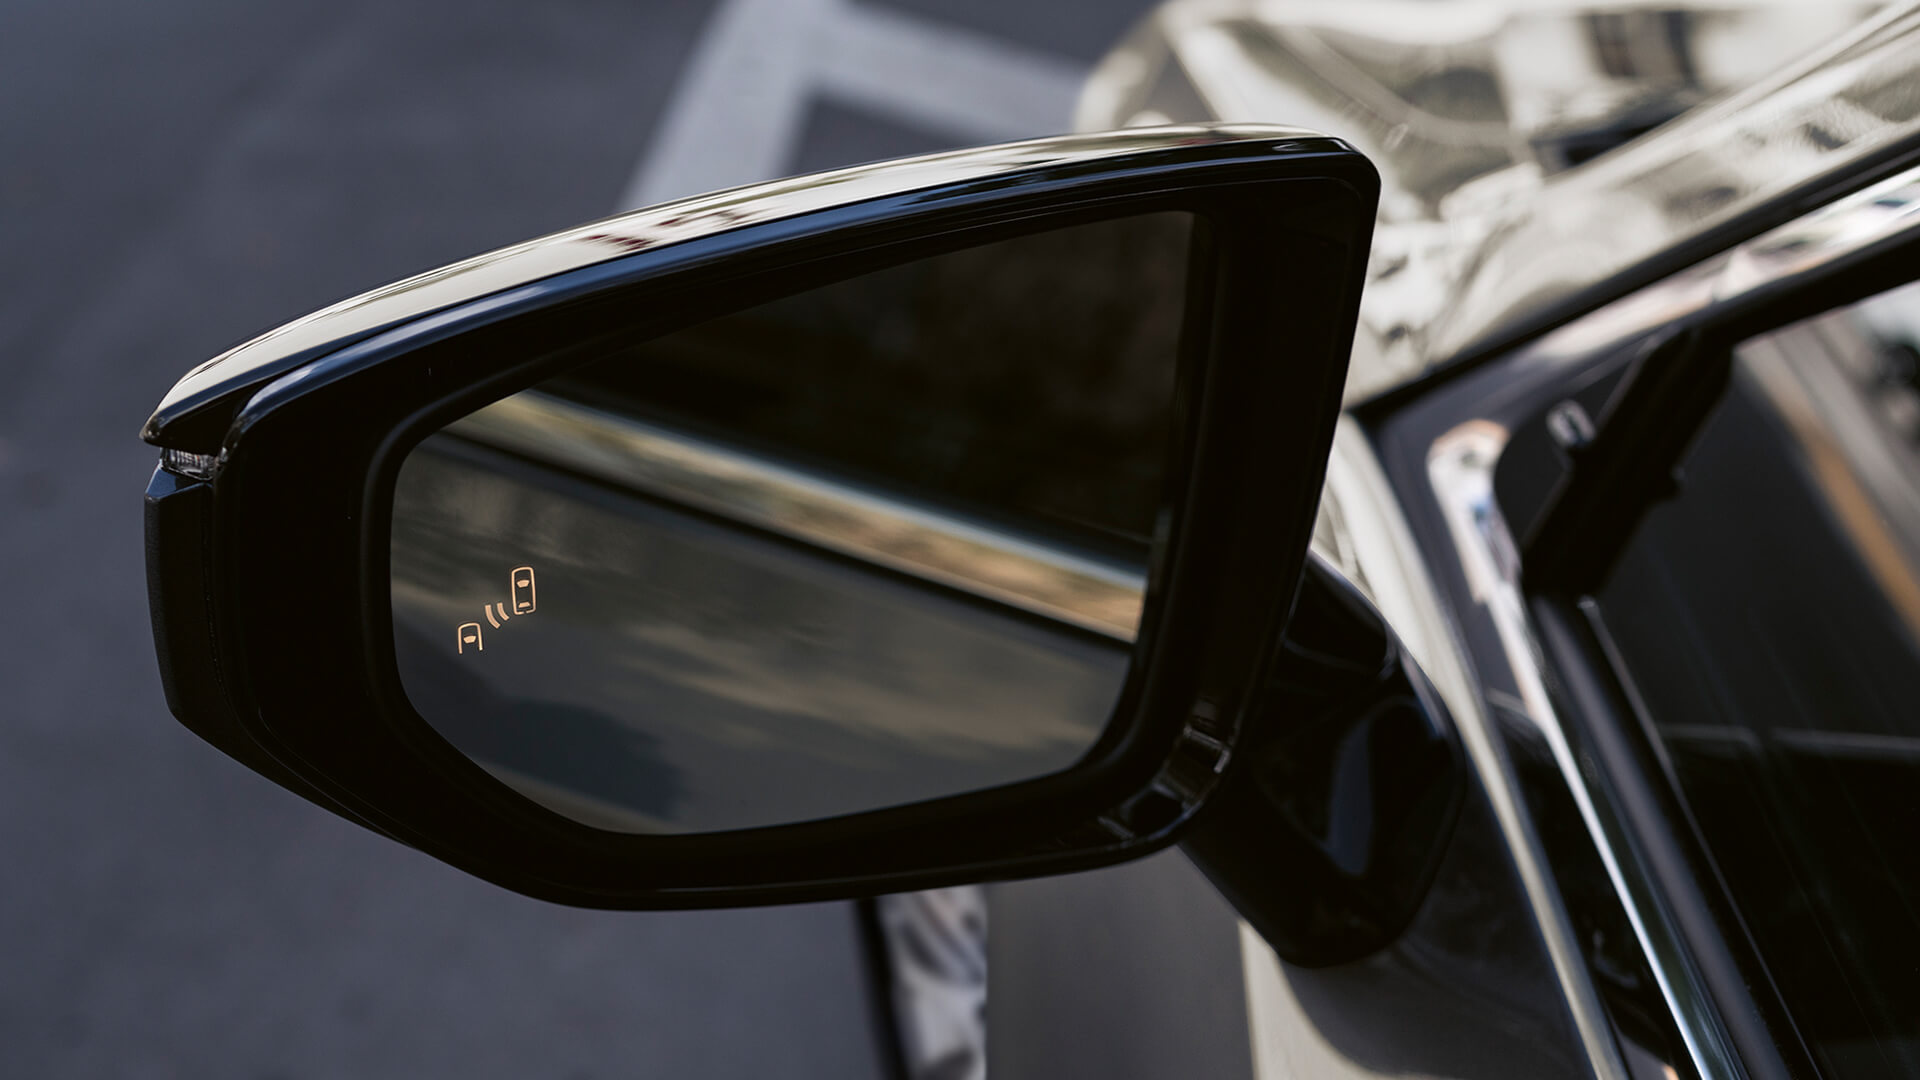 2021 lexus es hybrid experience feature blind spot monitor